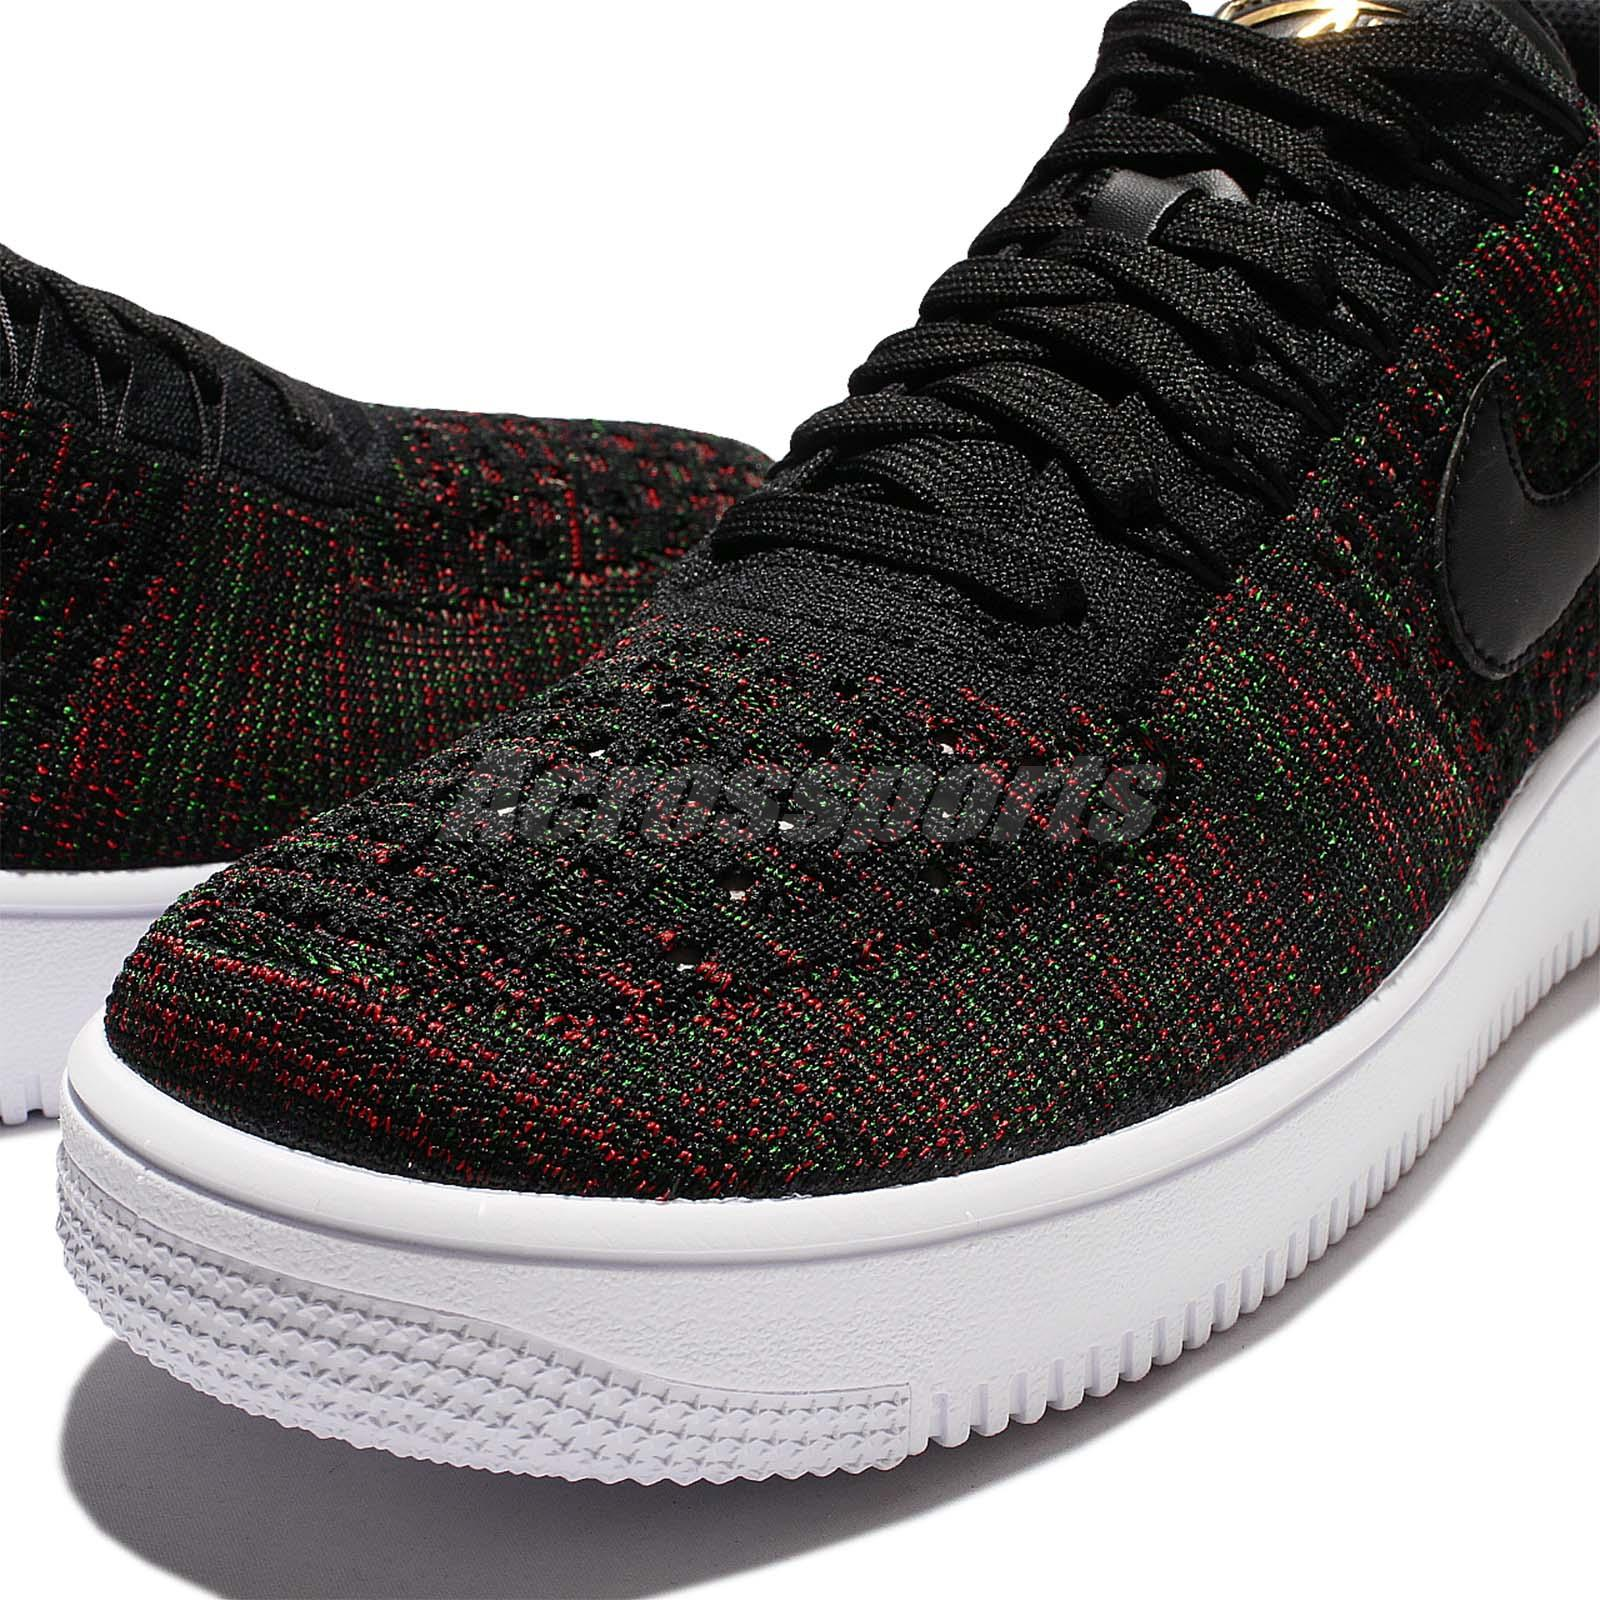 Nike Air Force 1 High Premium [386161 006] NSW Dark Shadow